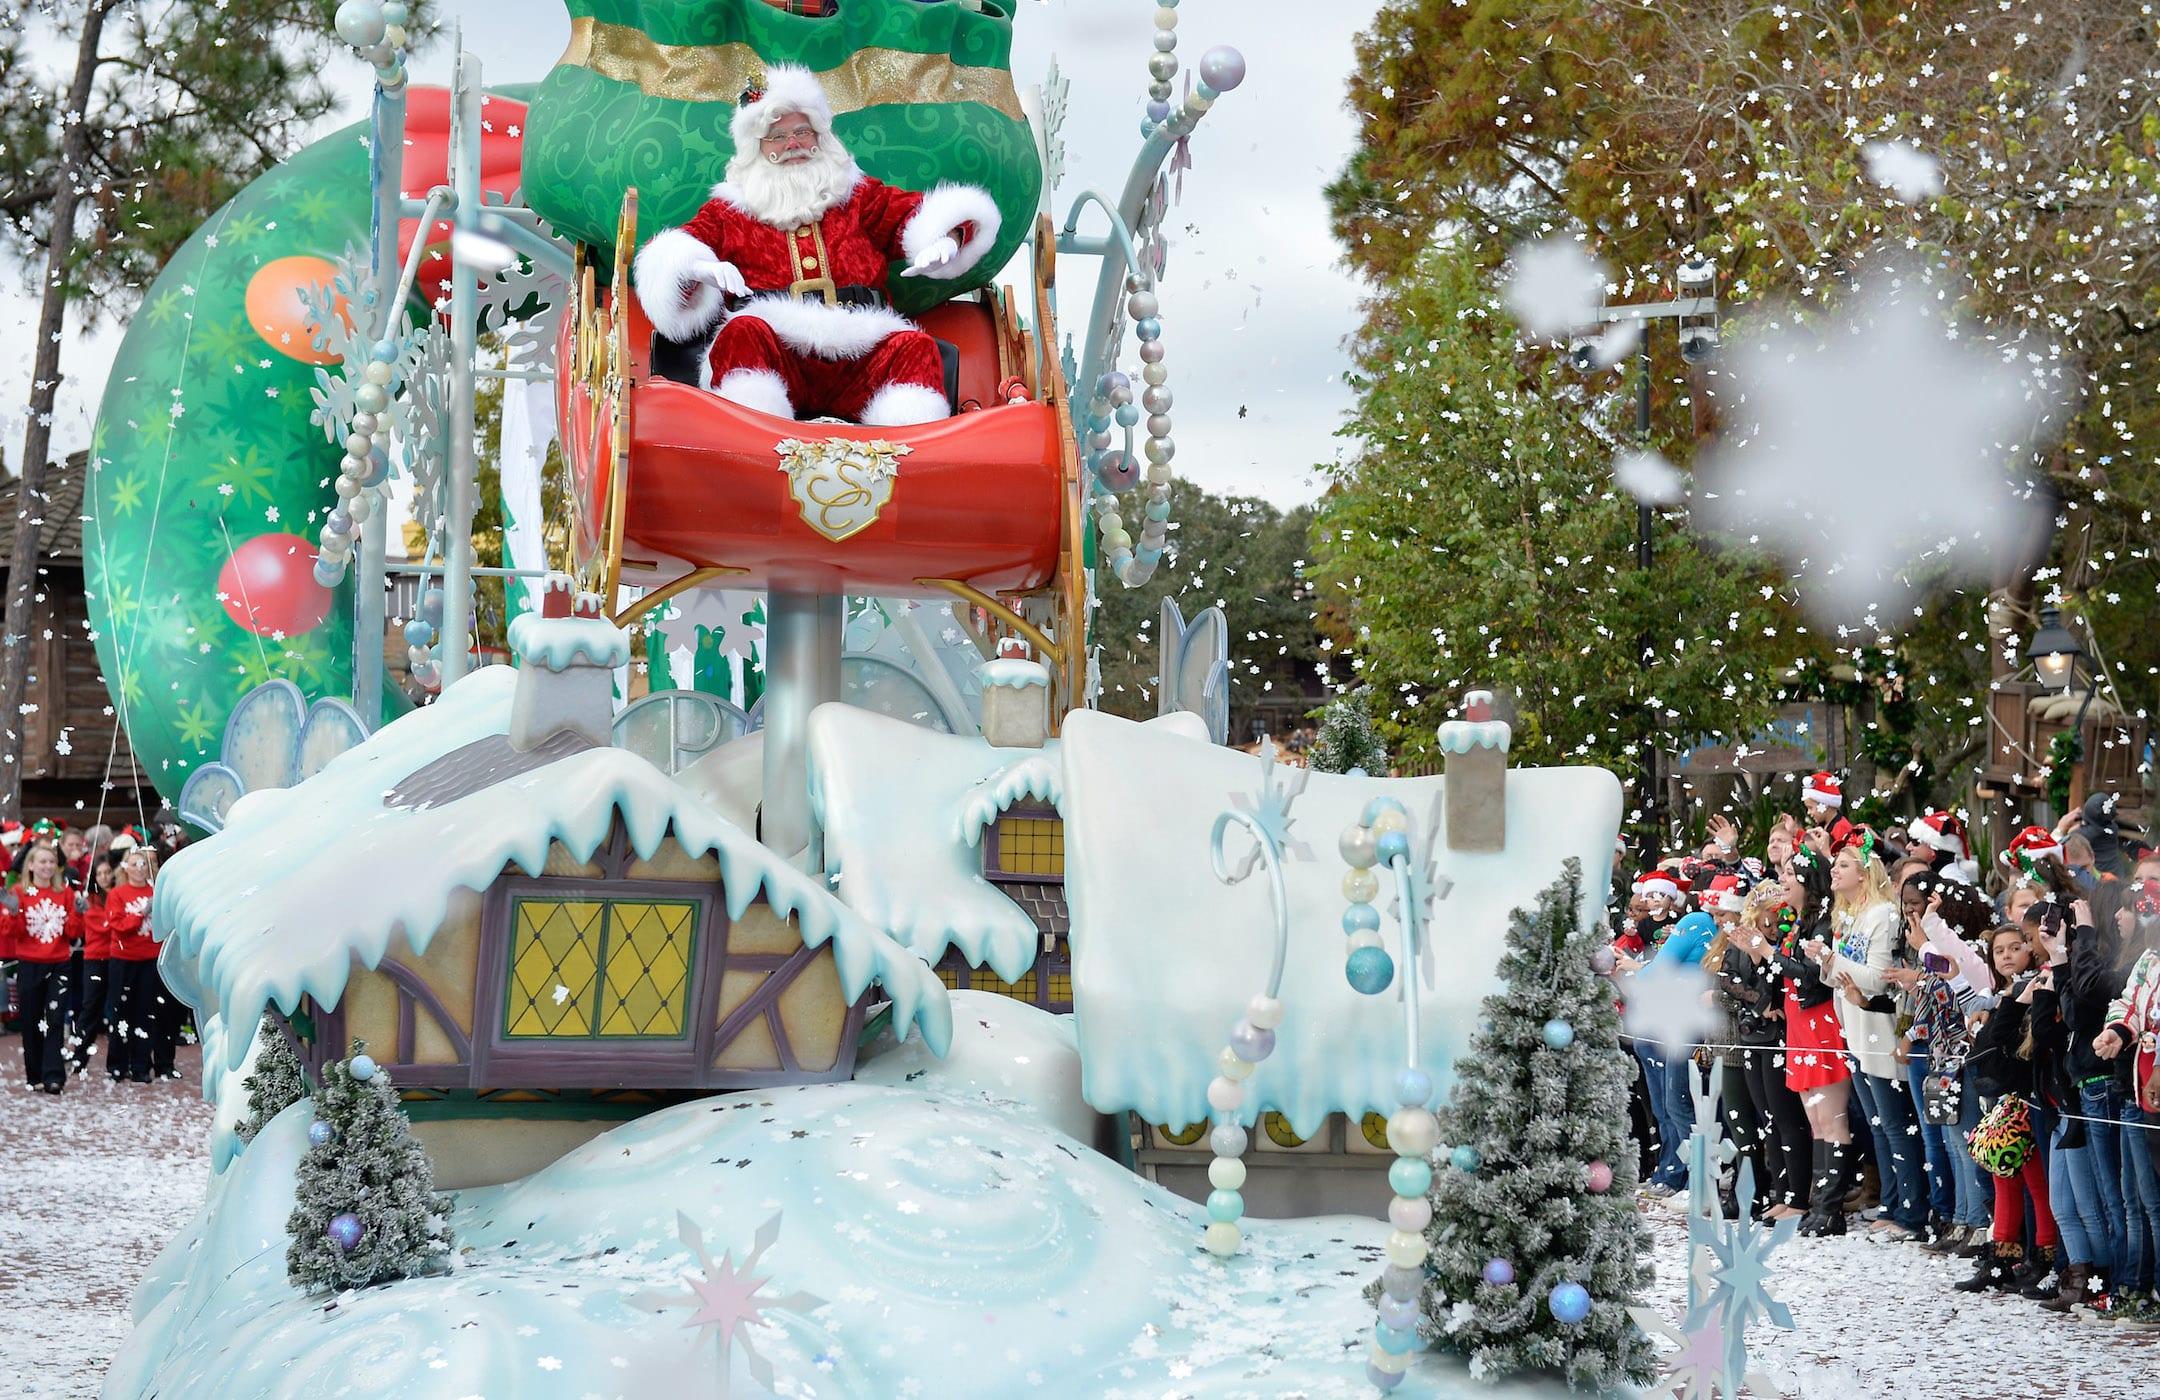 disney parks frozen christmas celebration tv special - Disney Christmas Day Parade